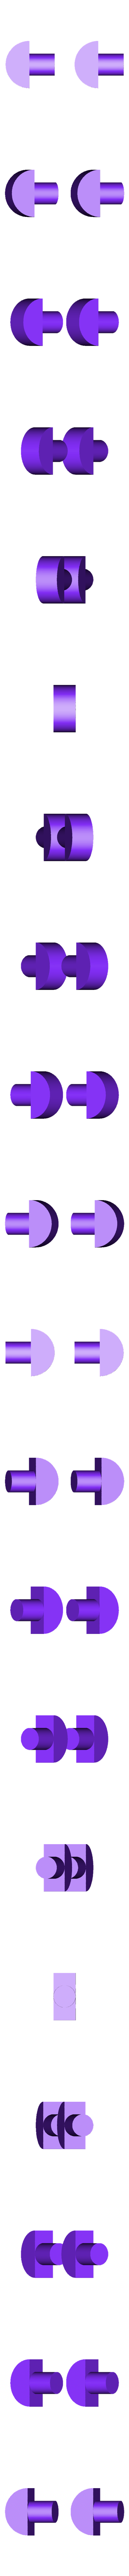 Oreille_x2_Click and smile_studio klipsi V1.1.stl Download free STL file Action figure - CLICK & SMILE - Starter pack • Model to 3D print, StudioKlipsi